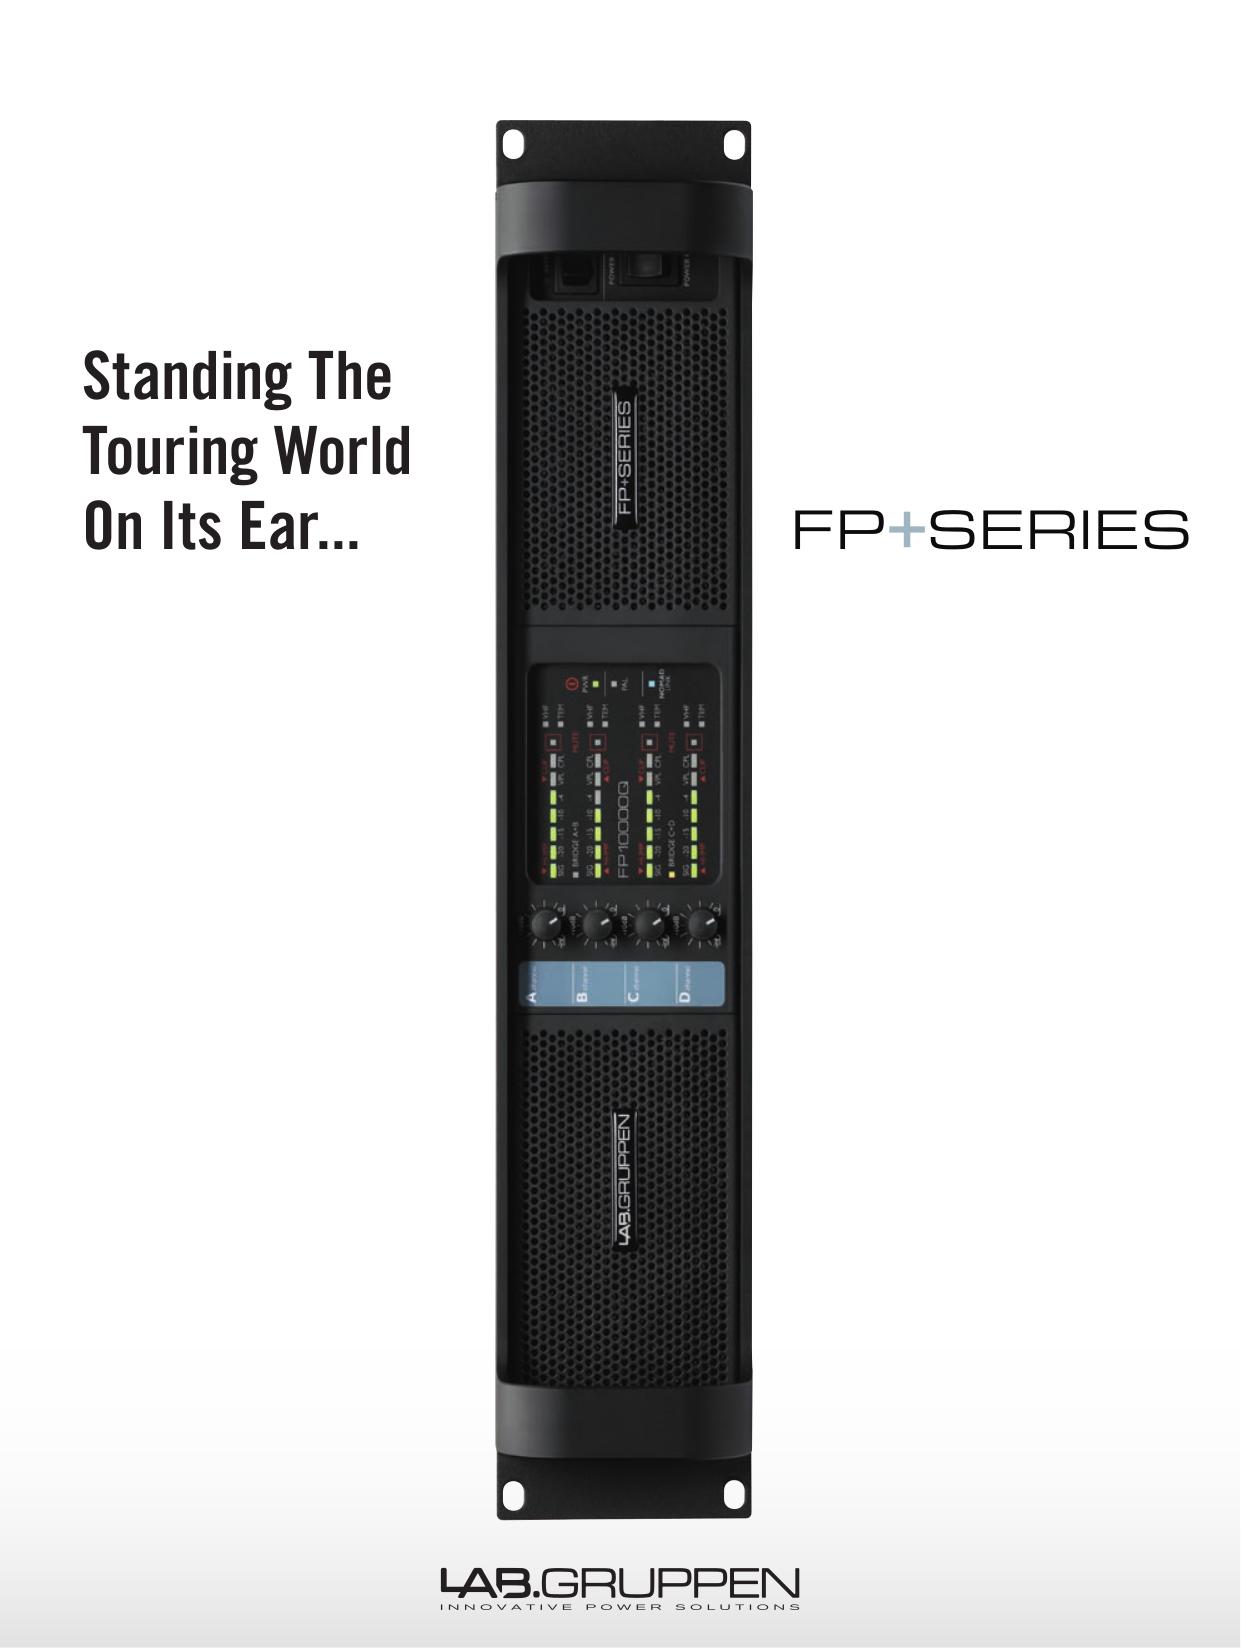 pdf for Lab.gruppen Amp fP Series FP 6400 manual